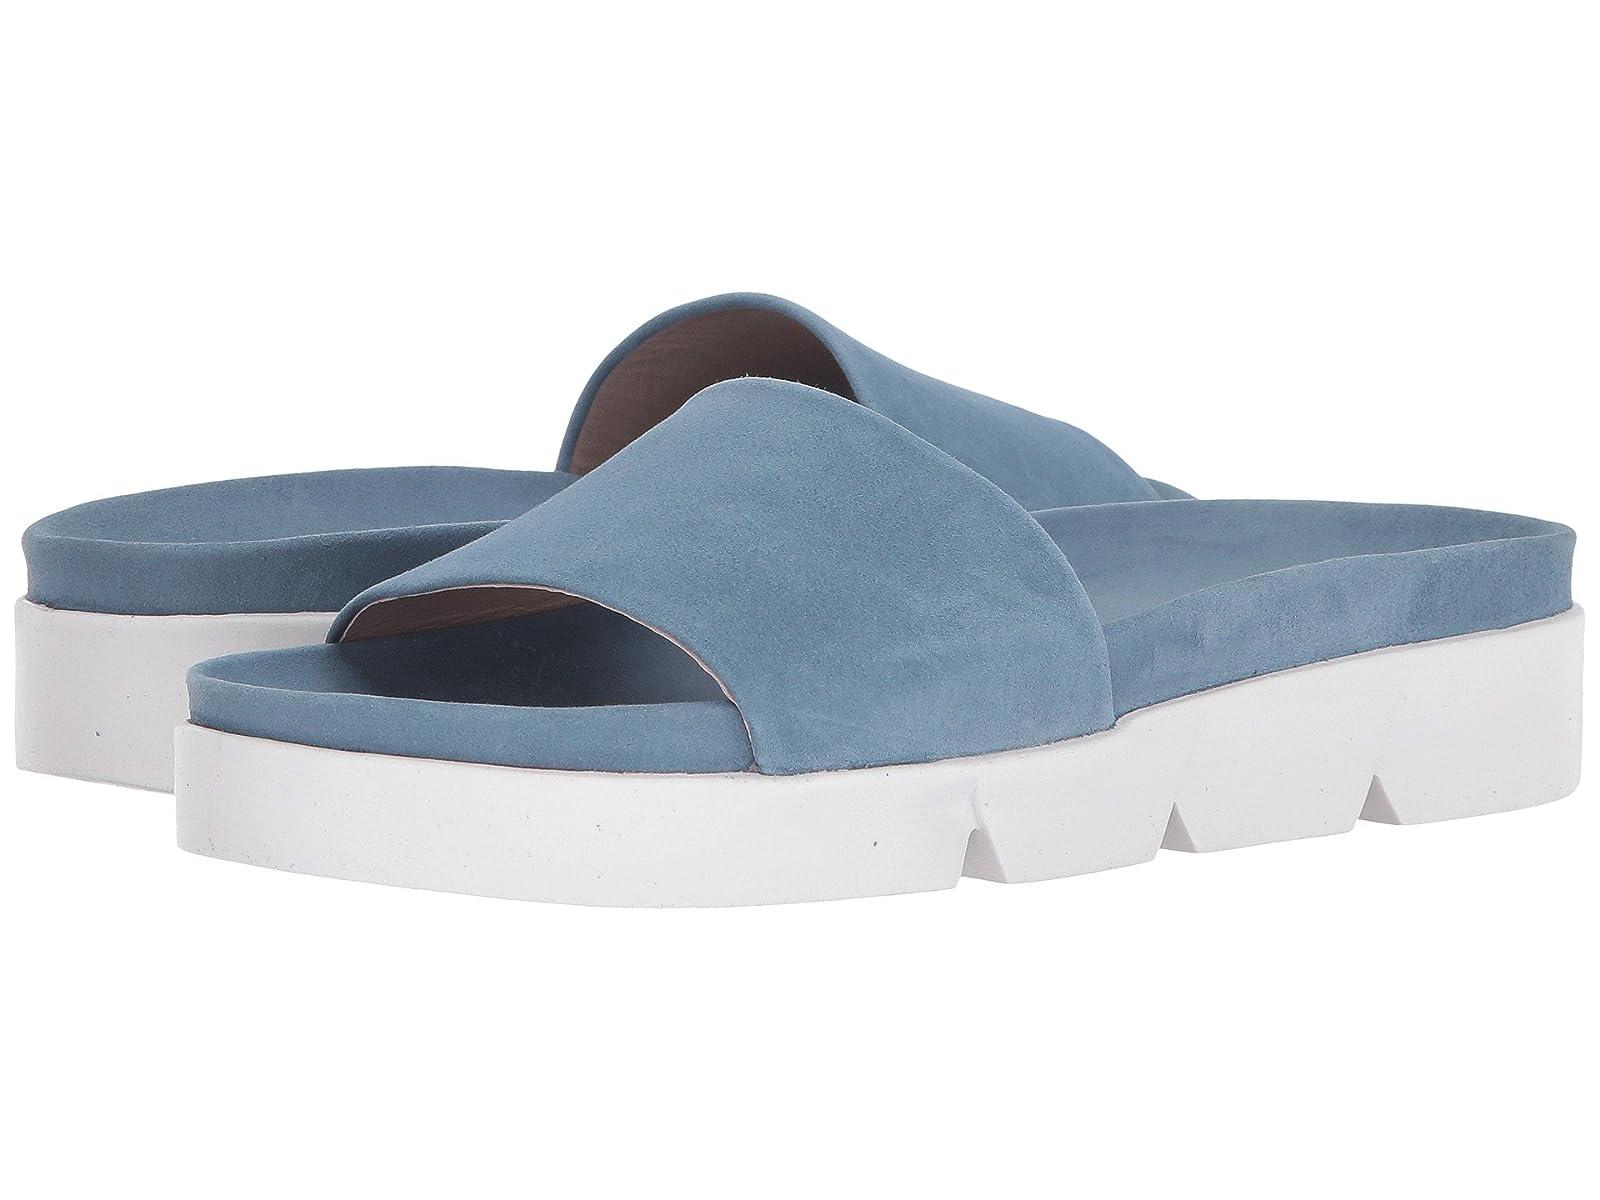 Stuart Weitzman LandslideCheap and distinctive eye-catching shoes